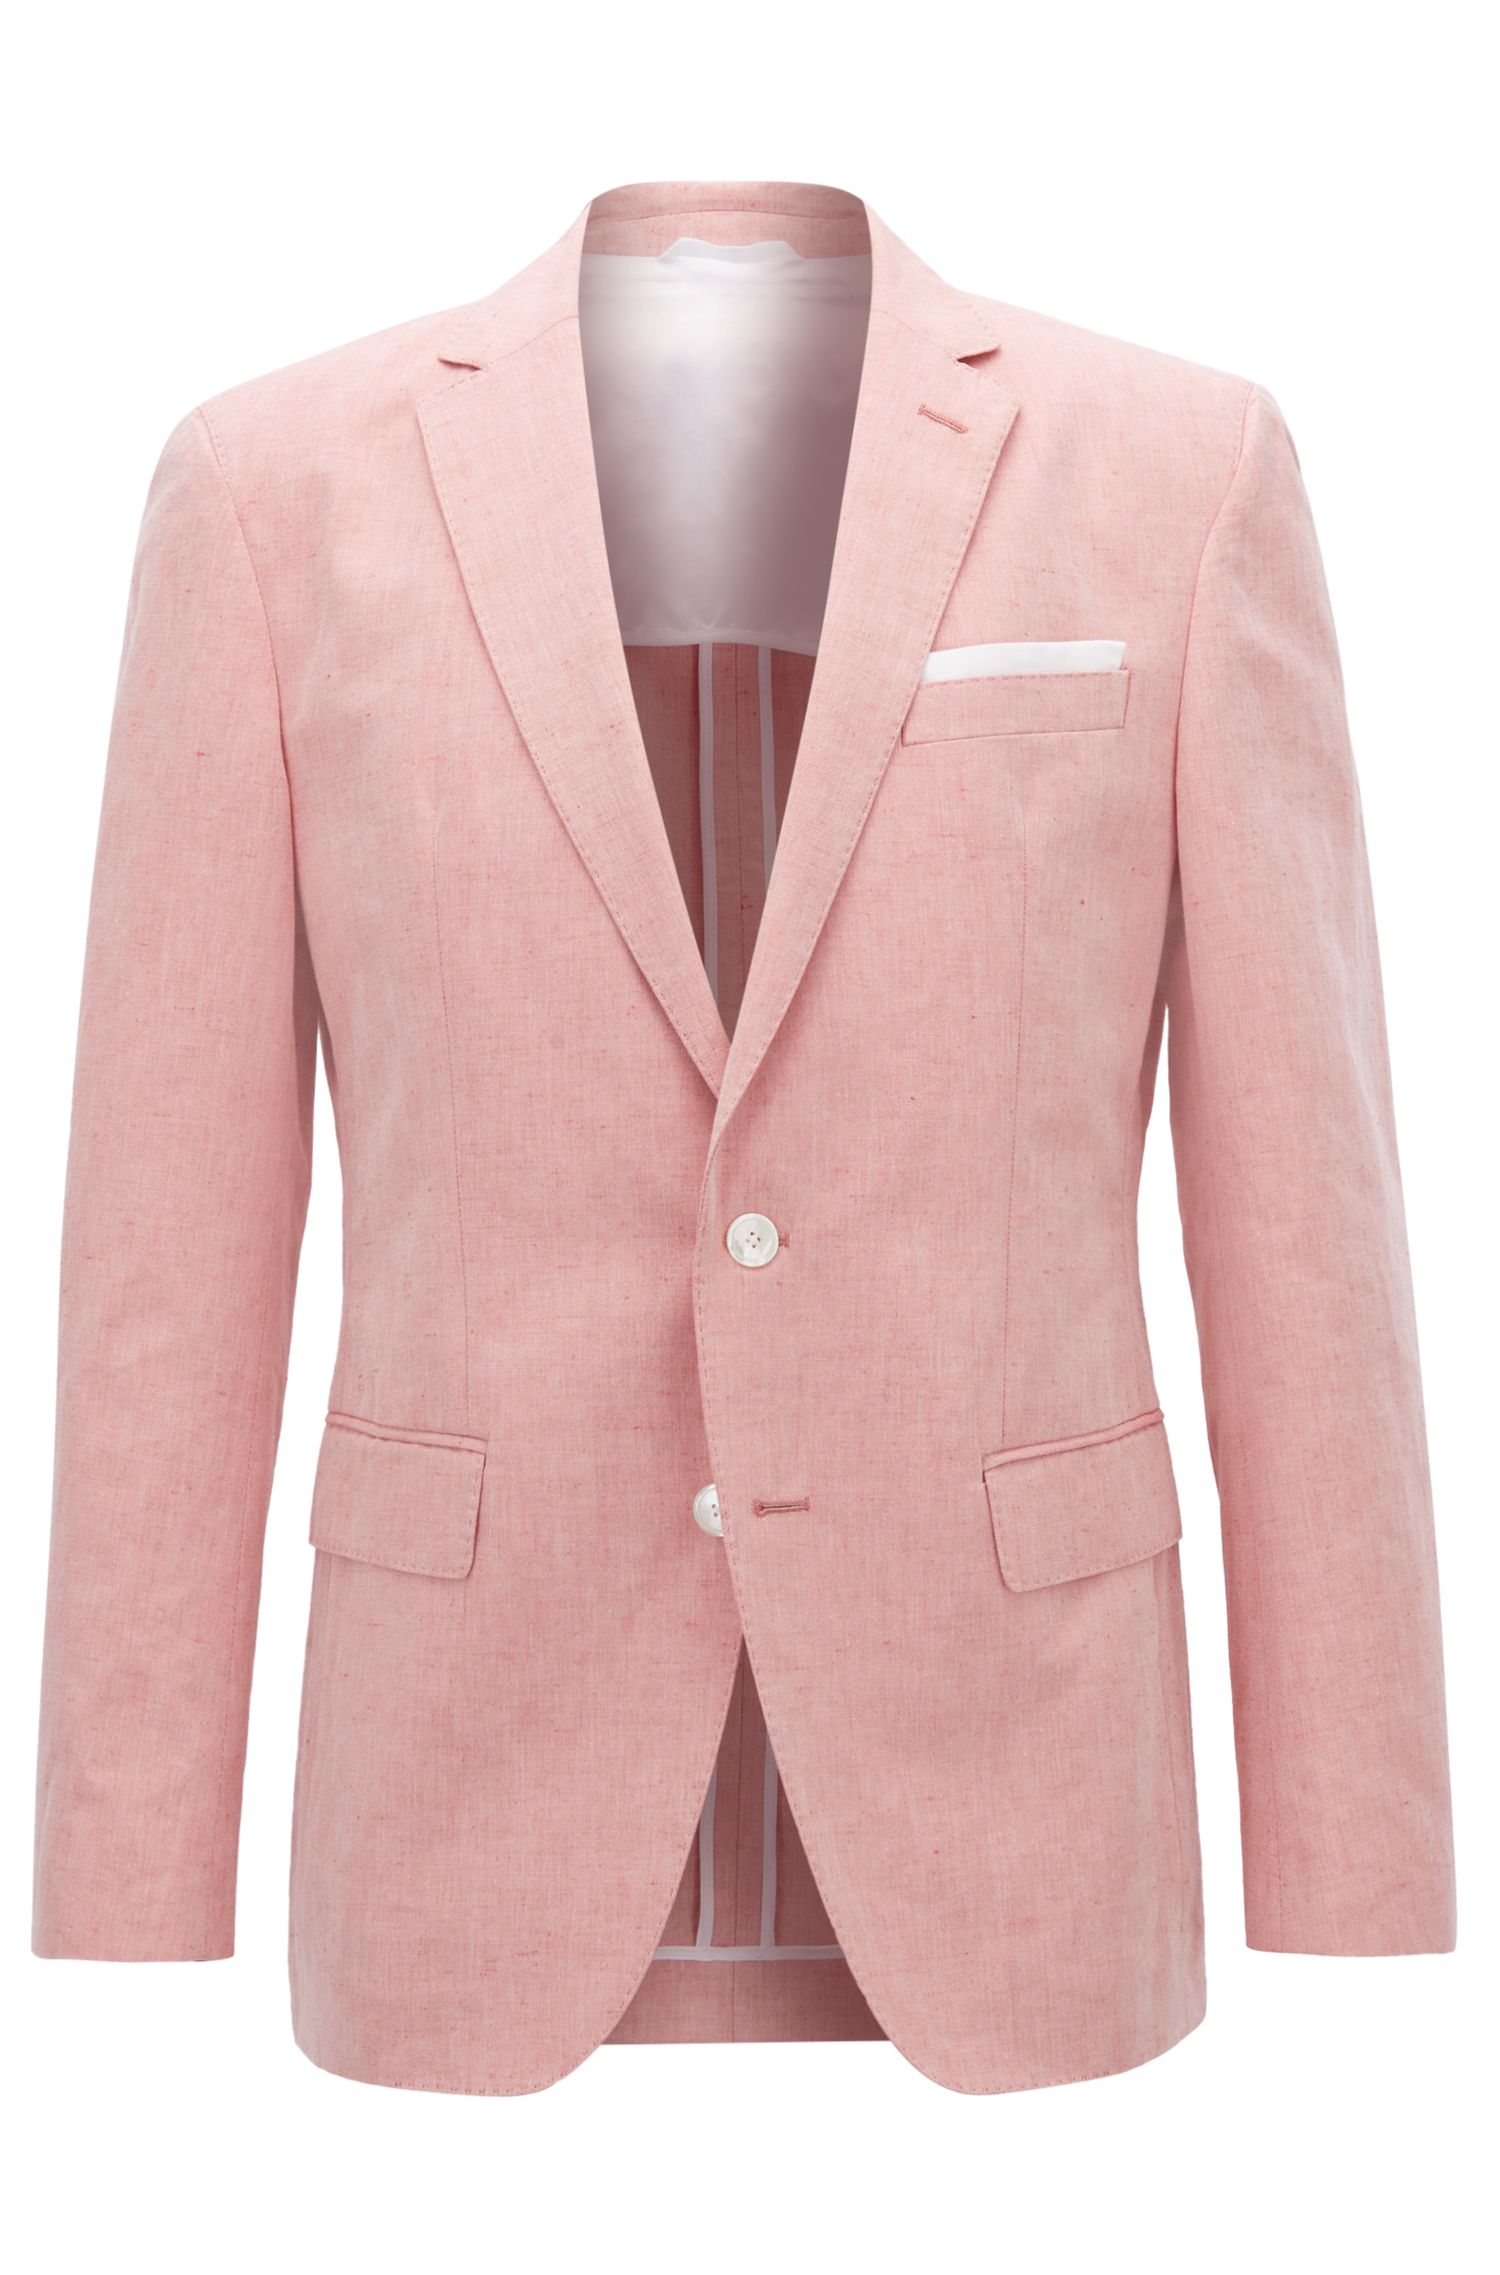 Linen Cotton Sport Coat, Slim Fit | Hartlay